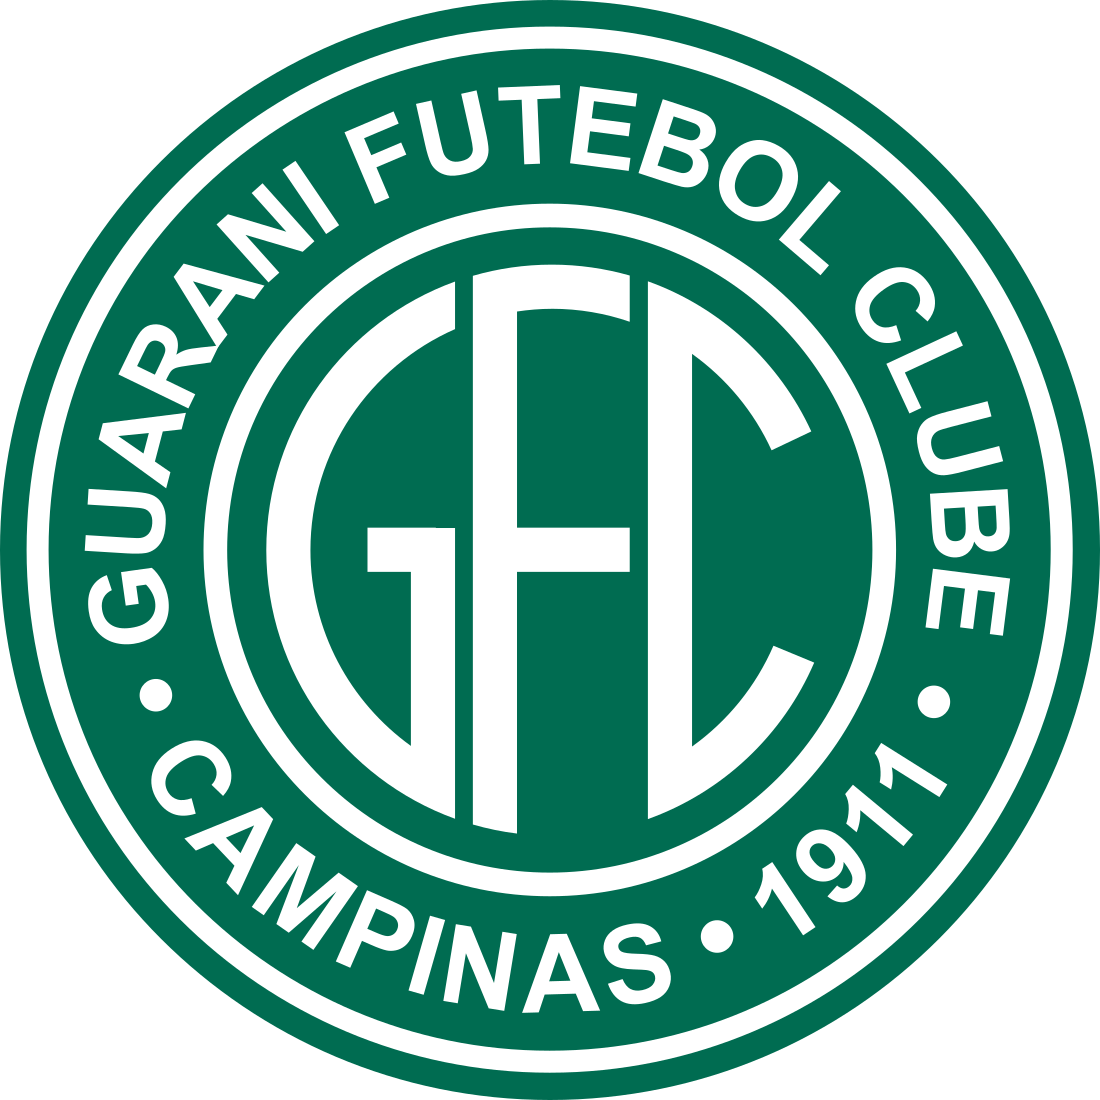 Guarani fc logo esudo 7 - Guarani FC Logo - Guarani FC Escudo